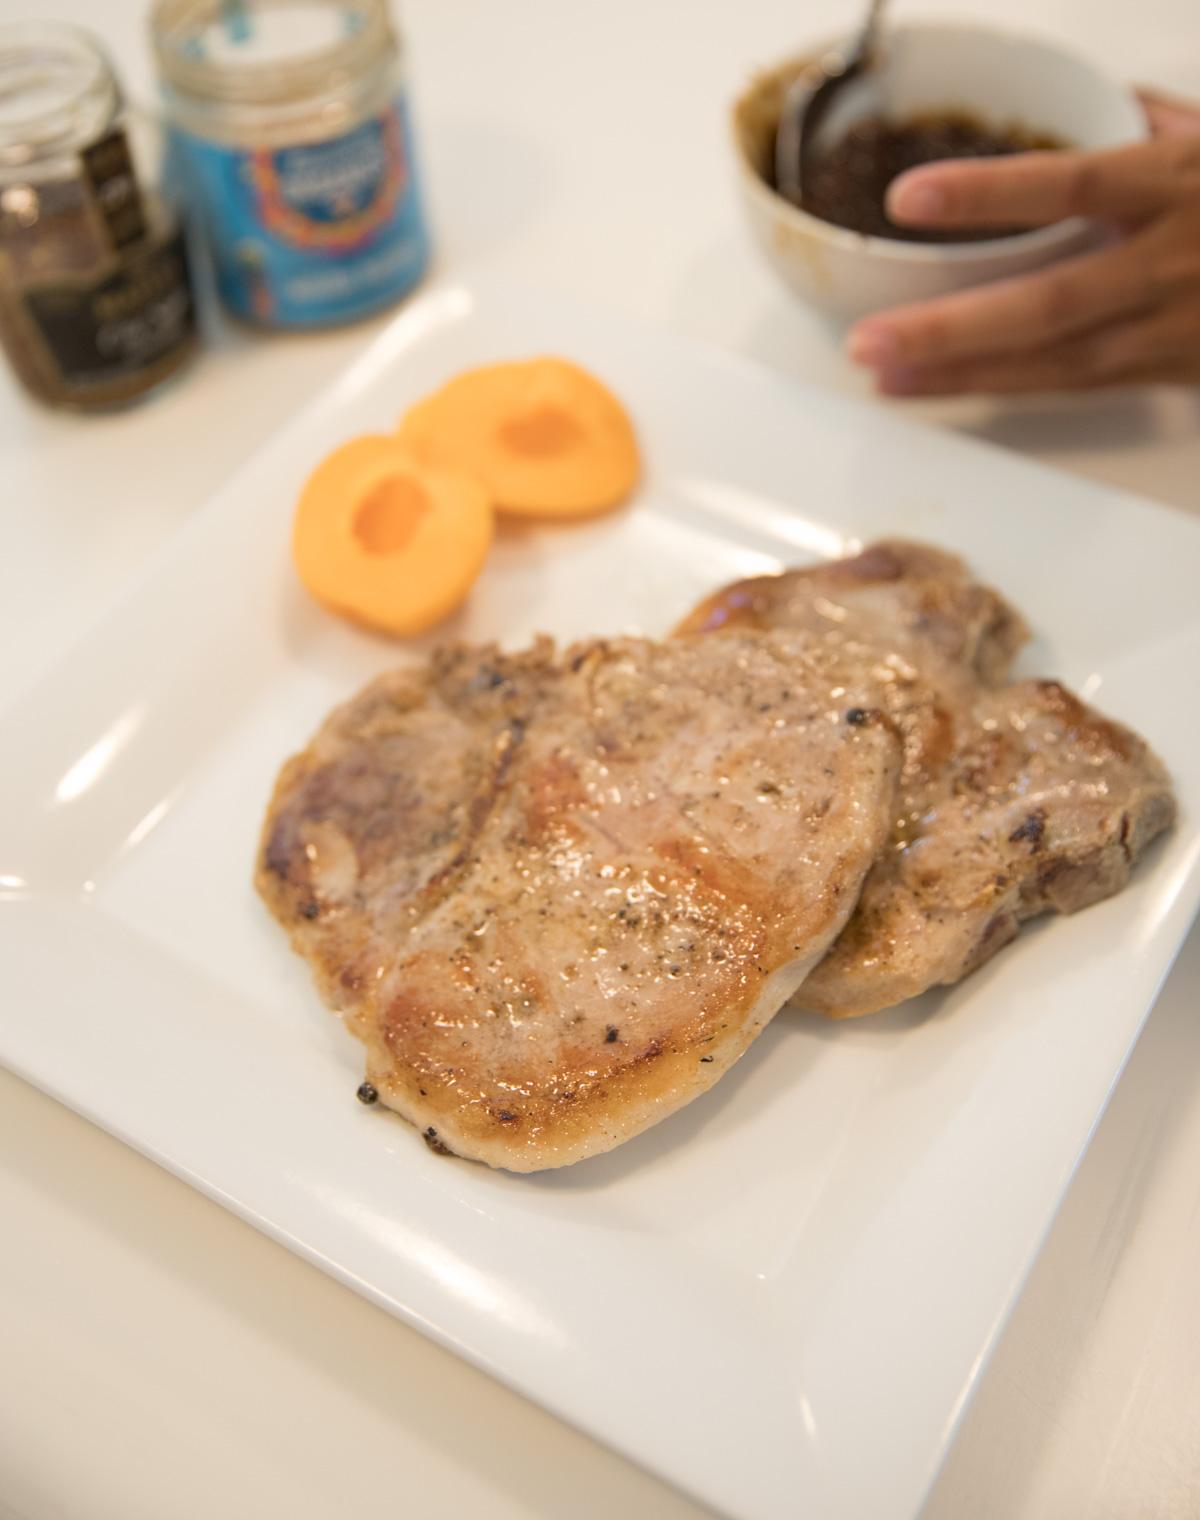 Sous Vide Recipes - FoodSaver Bags